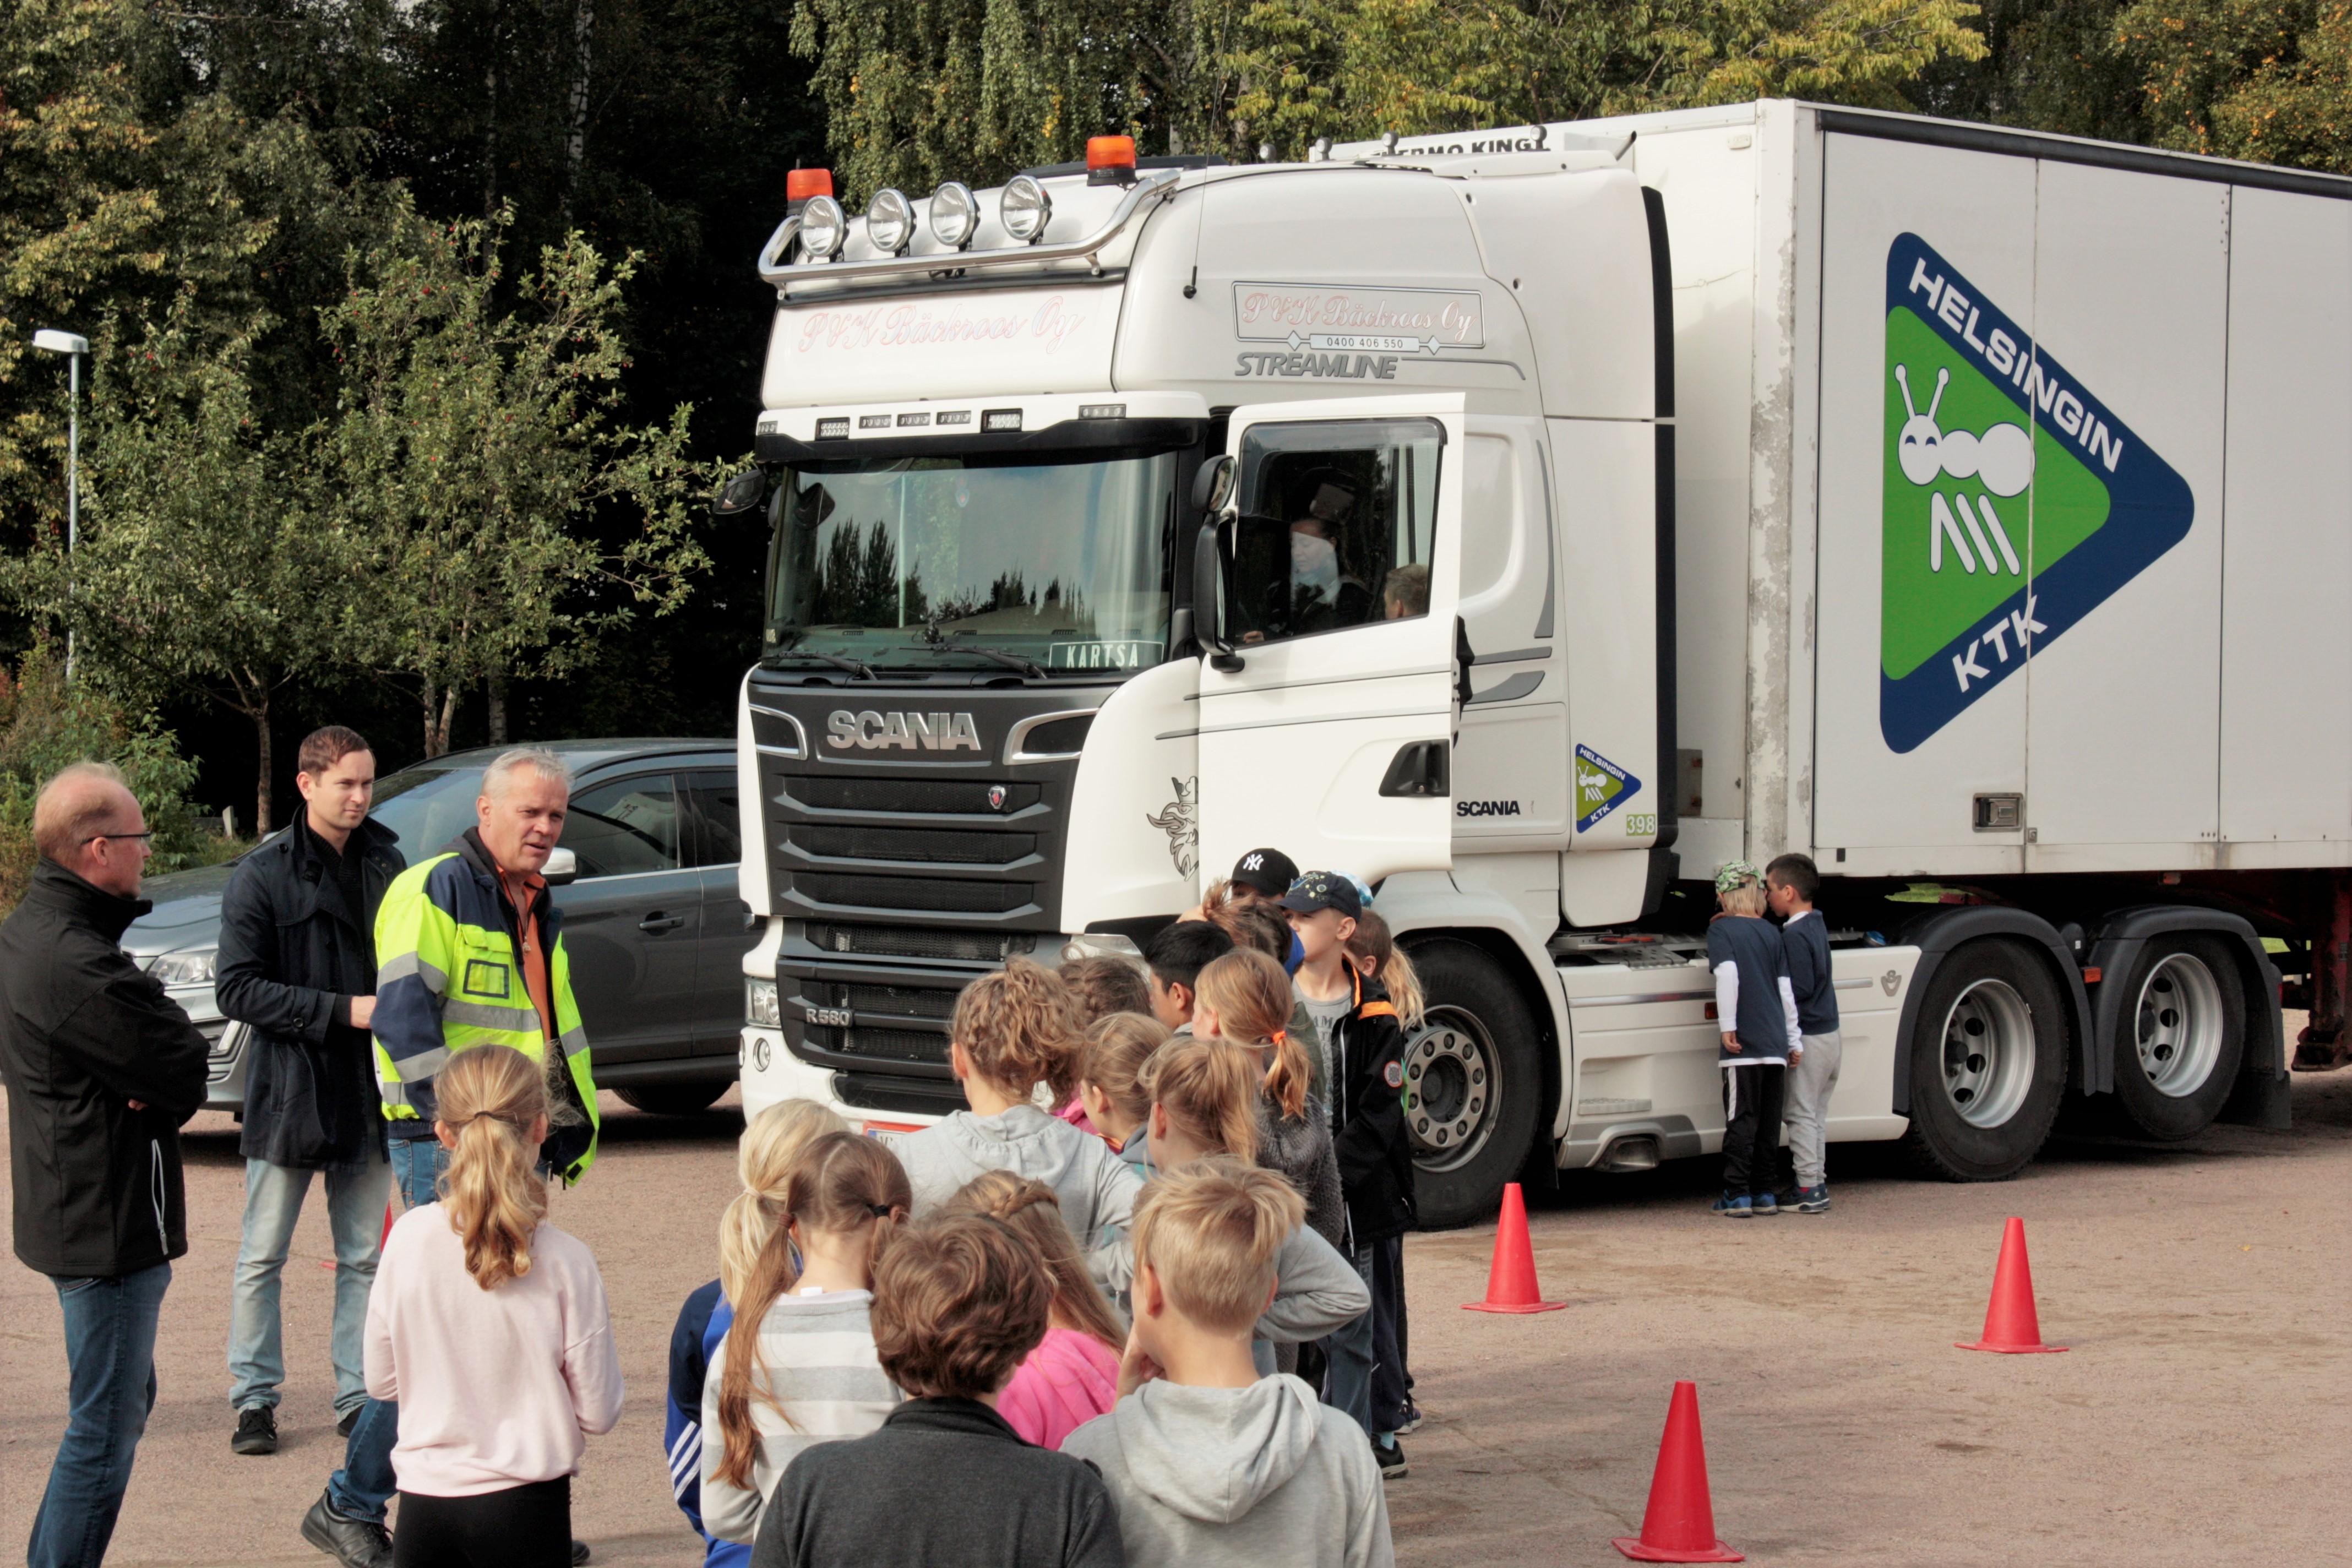 Liikennöitsijä Kari Bäckroos ja Helsingin KTK:n toimitusjohtaja Jyrki Lindroos opastivat alakoululaisia.